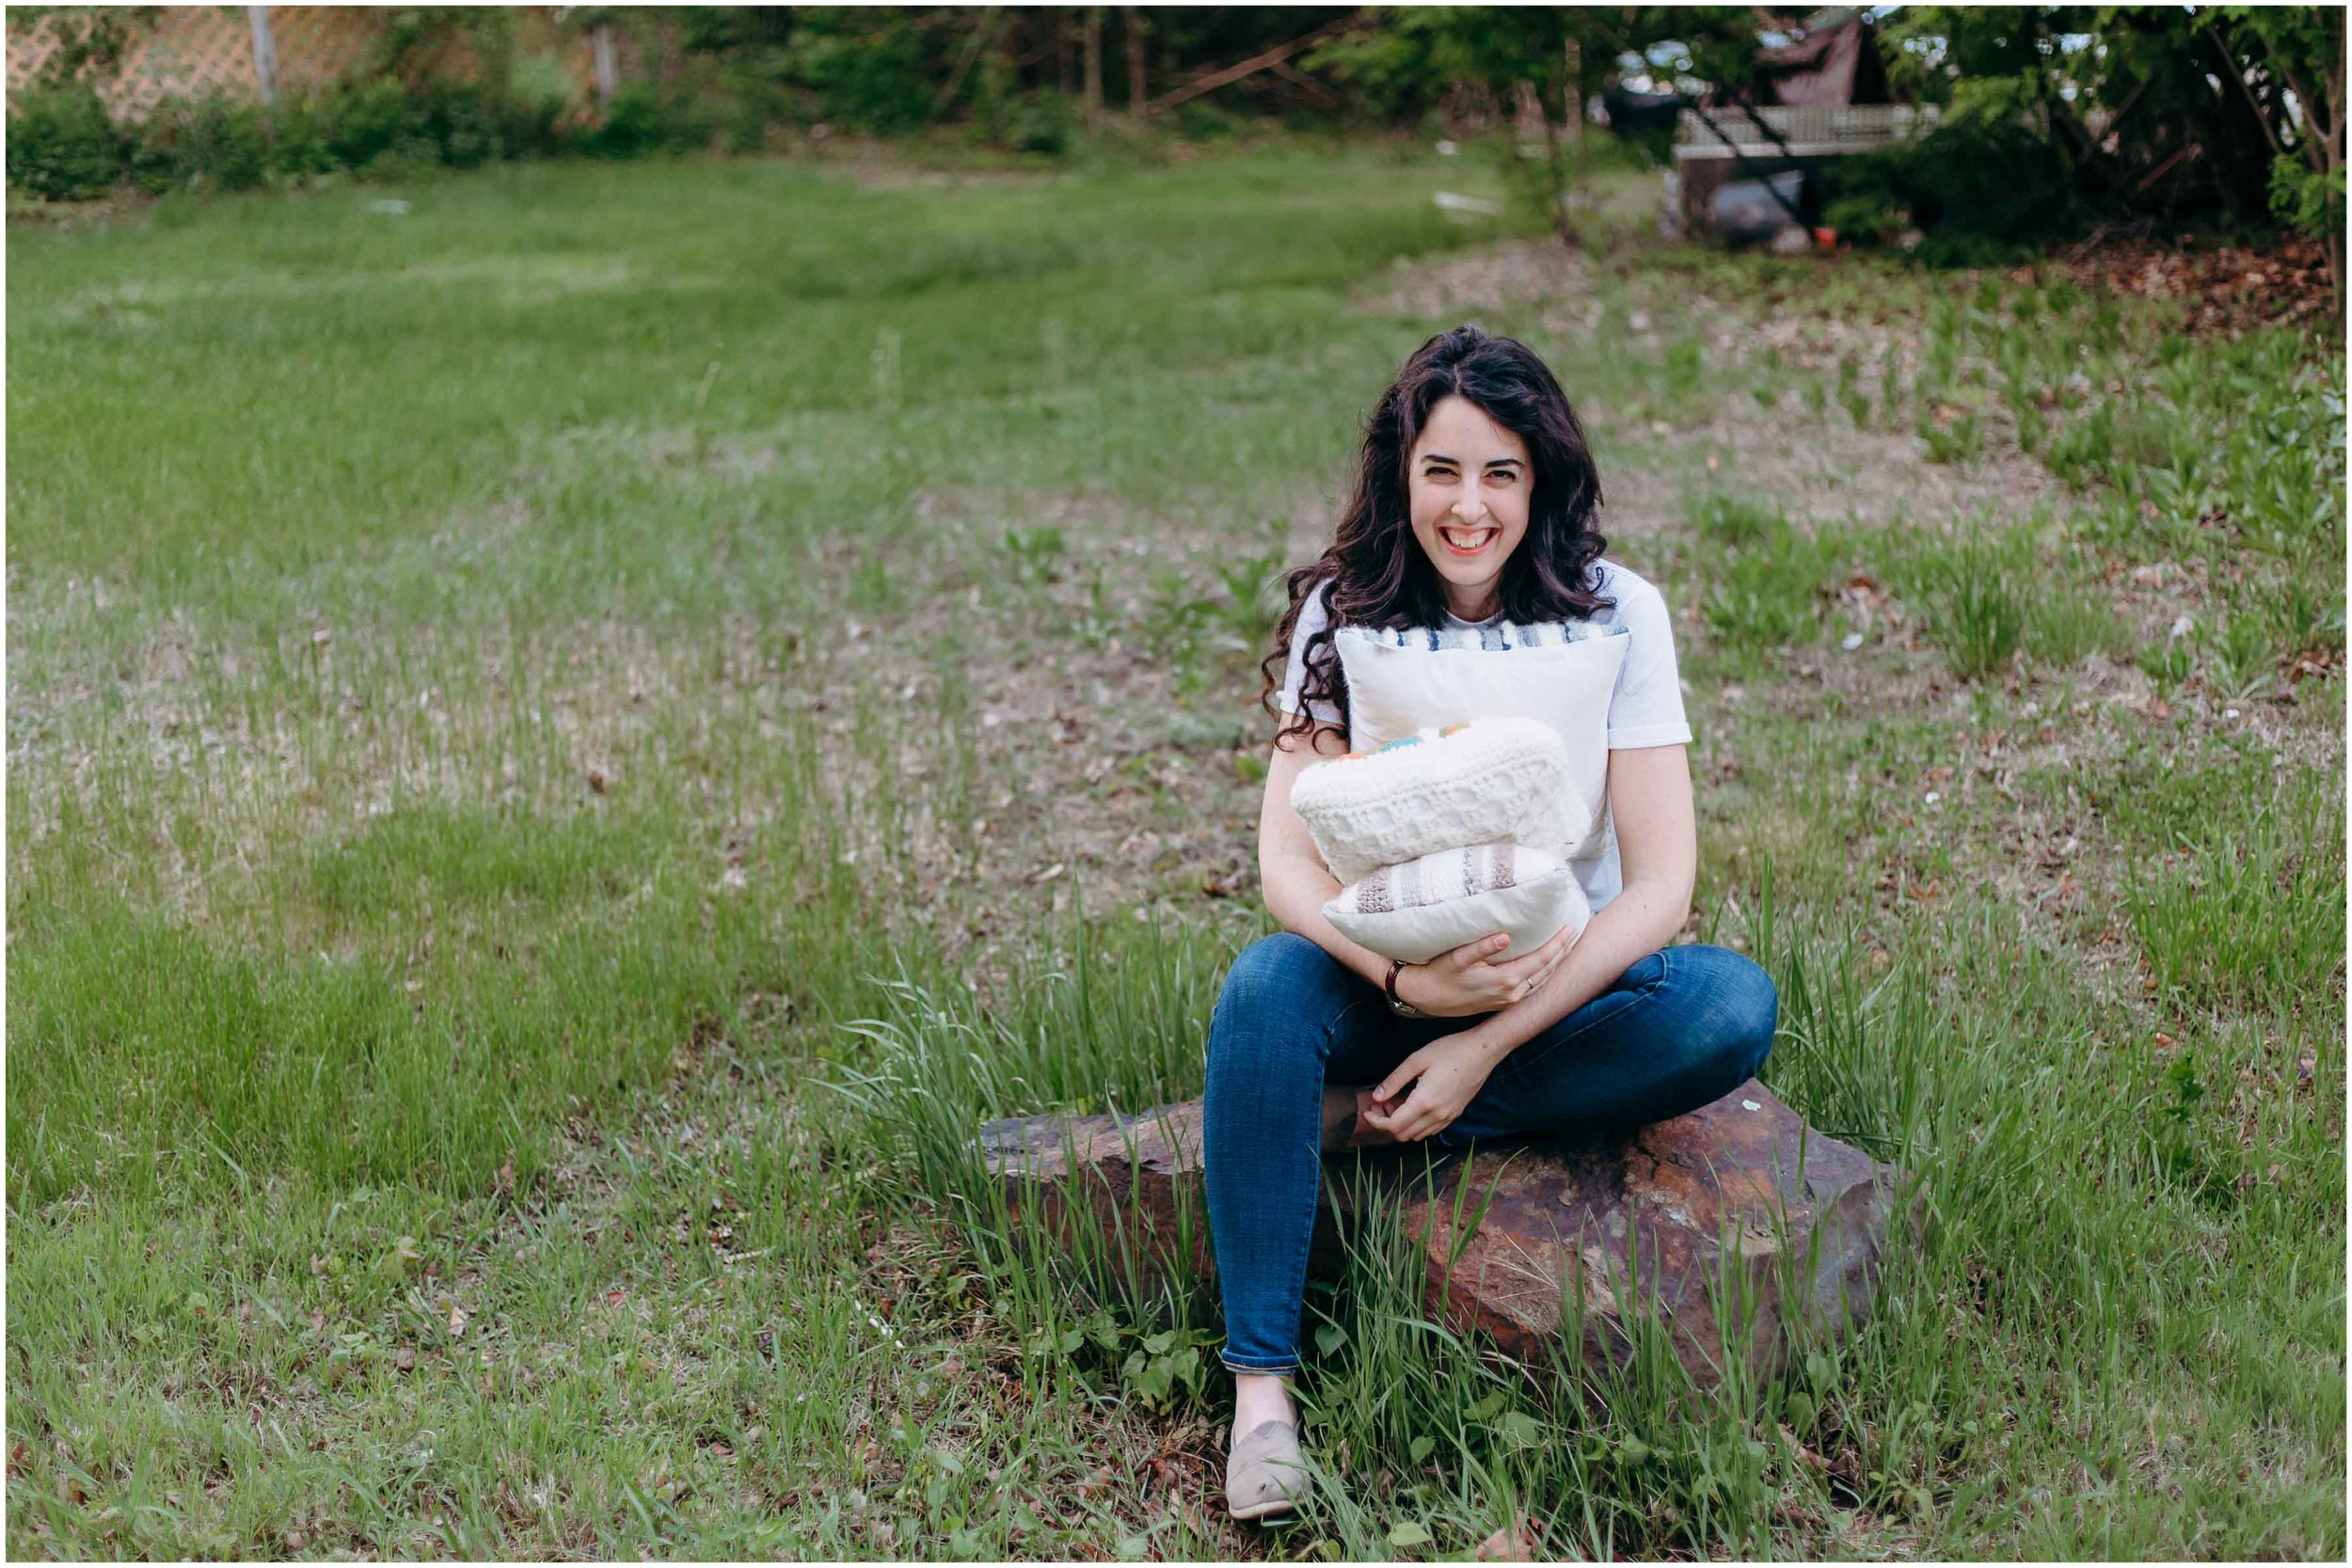 Melody Fulone Fiber Artist, Goffstown, New Hampshire Lifestyle Photographer